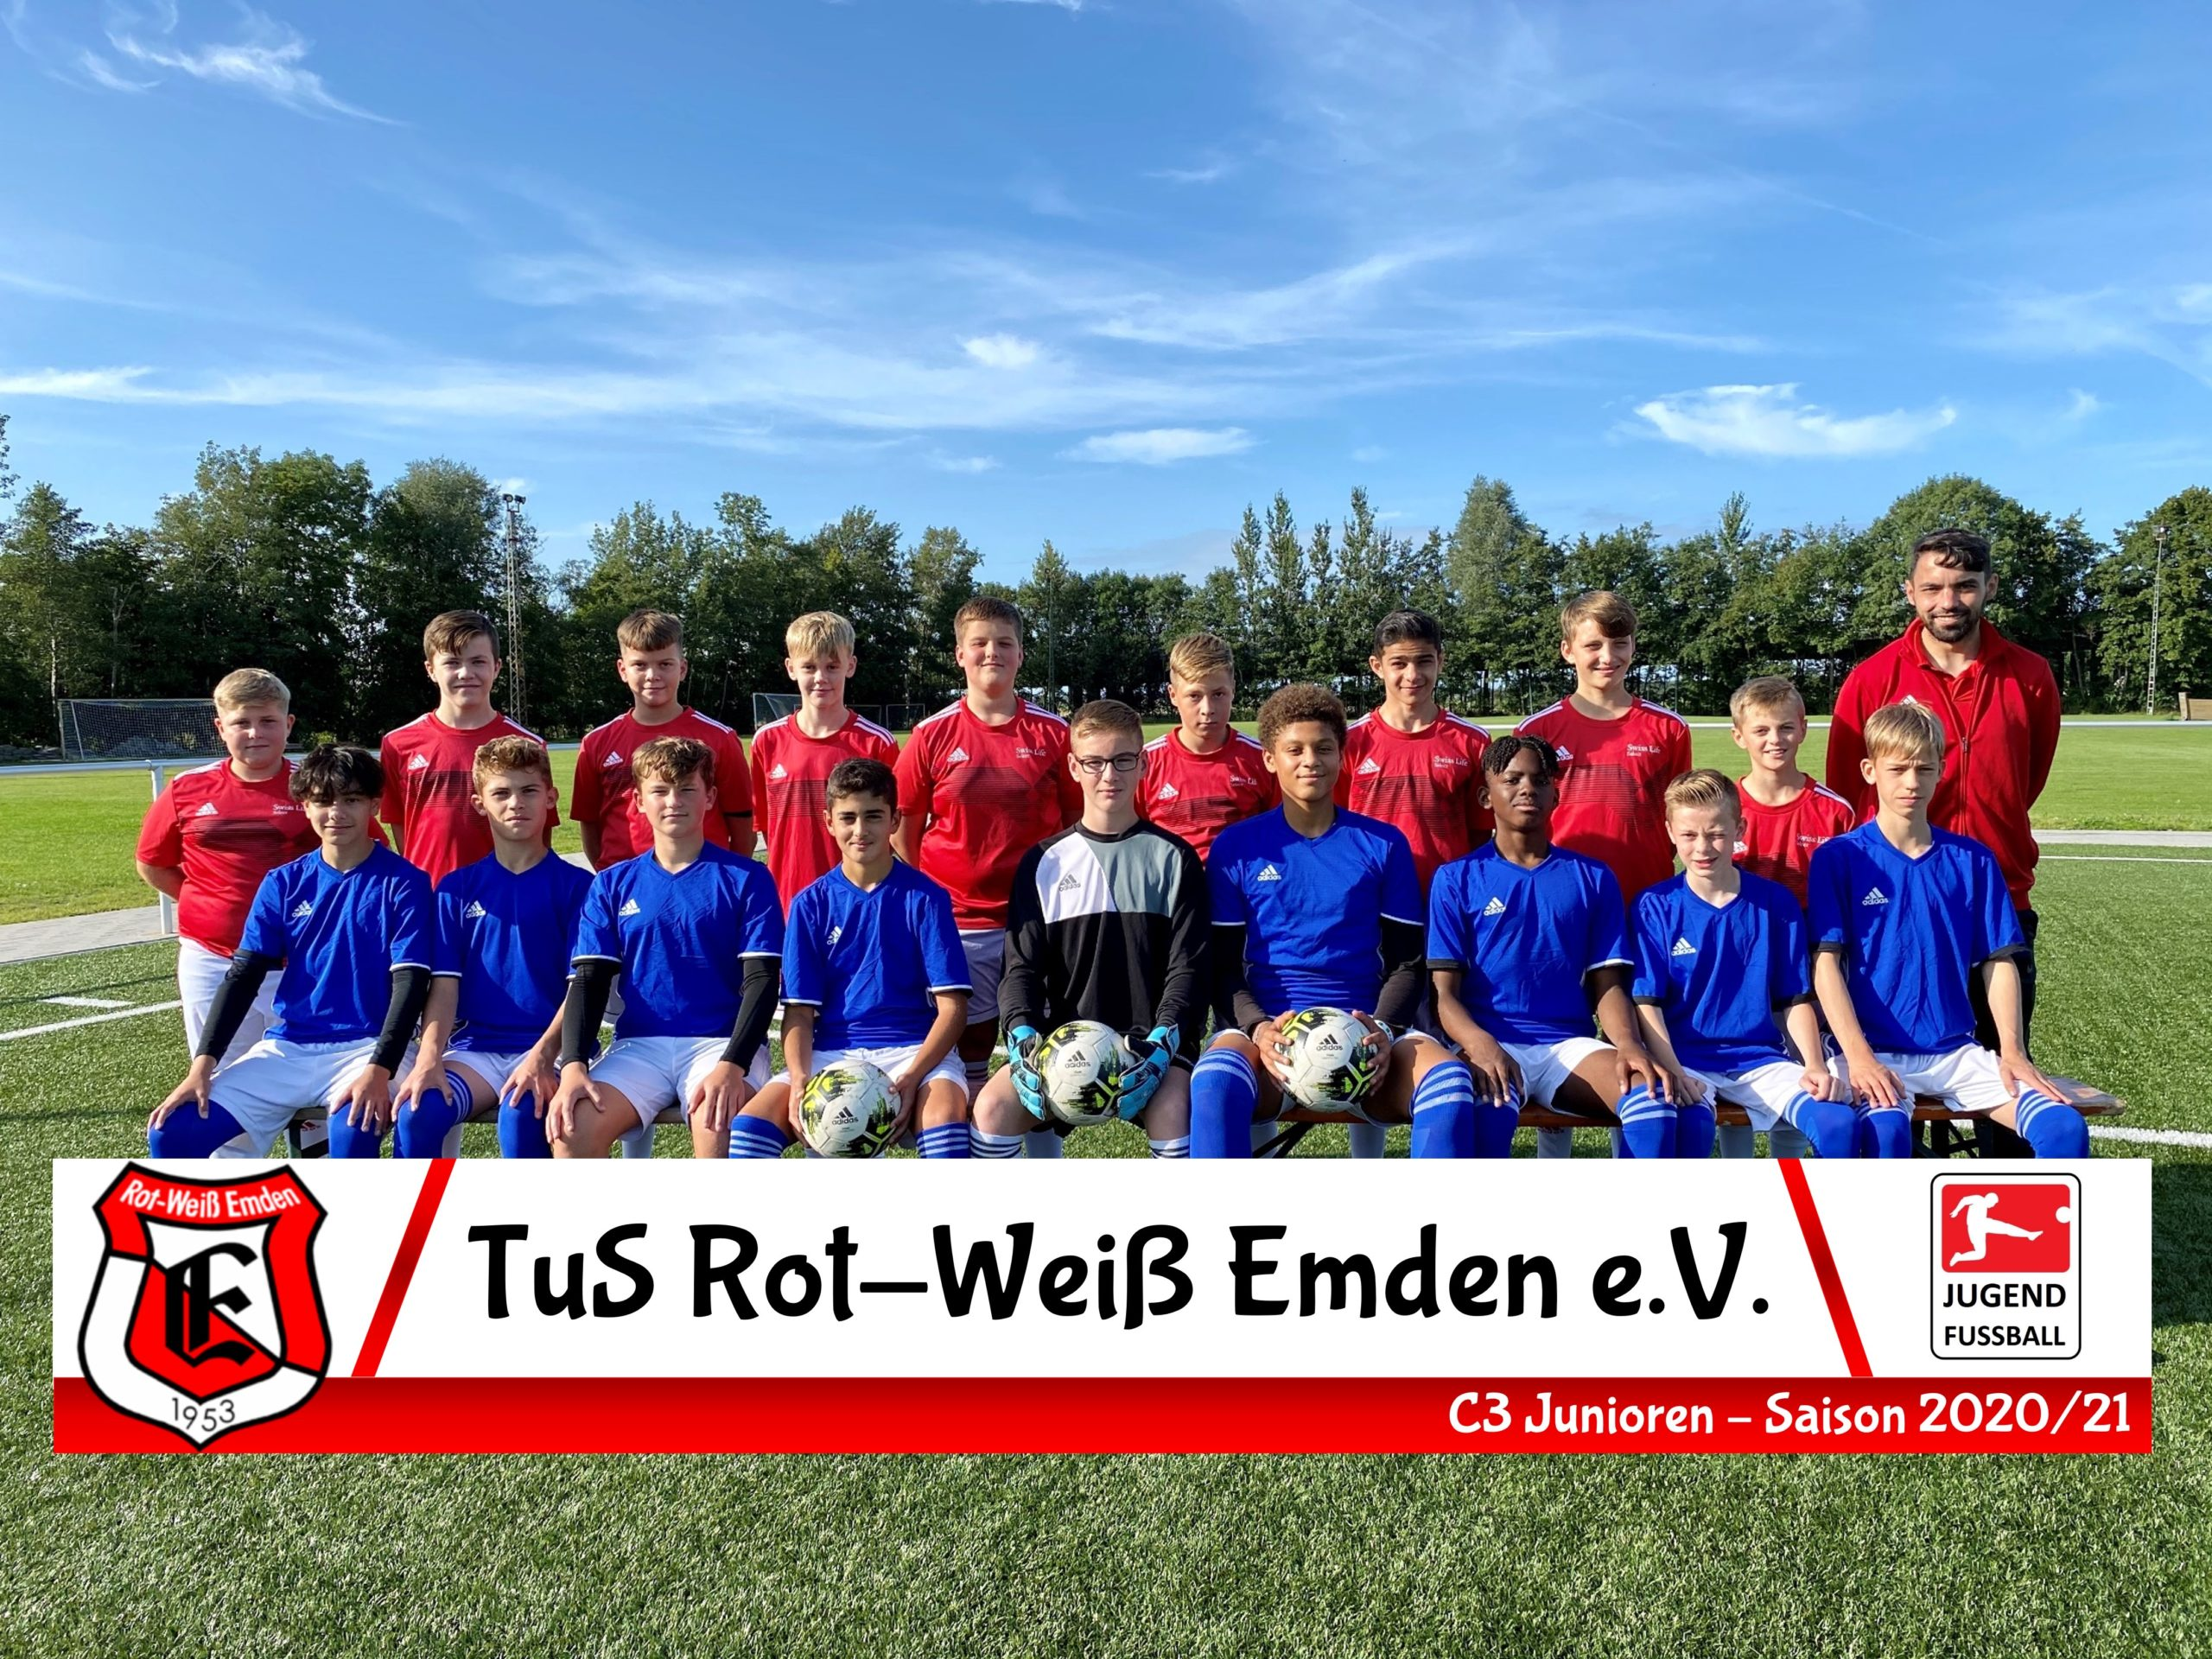 JSG TuS Rot Weiss Emden II / BSV Kickers Emden III Saison 20/21